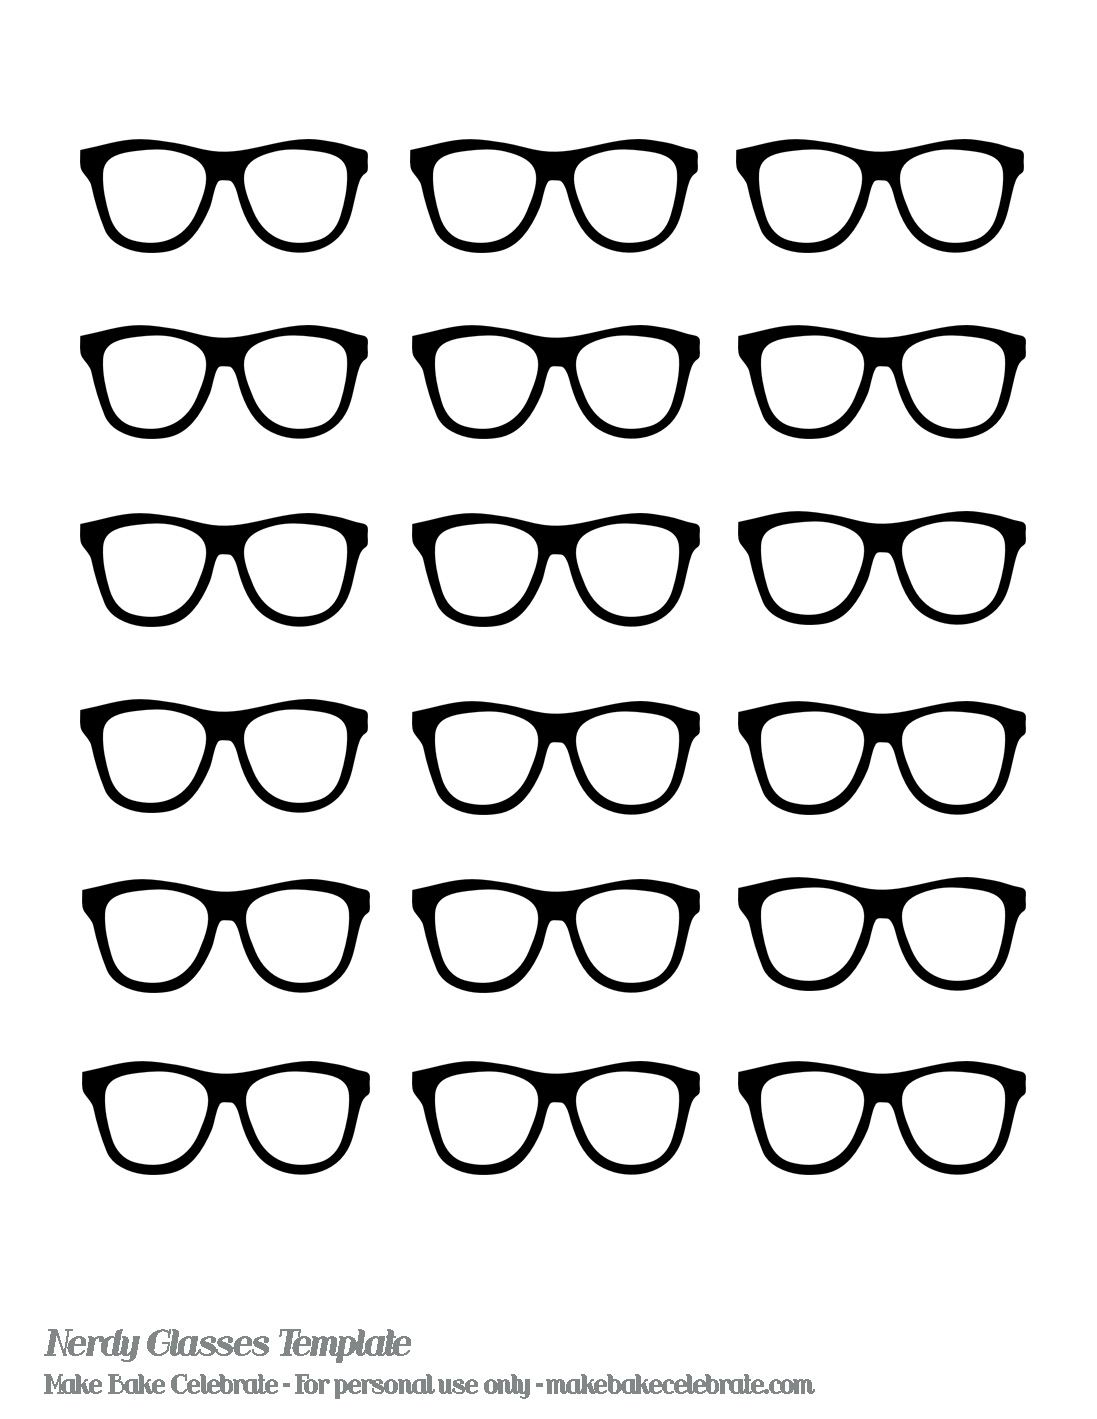 Nerd Glasses Template